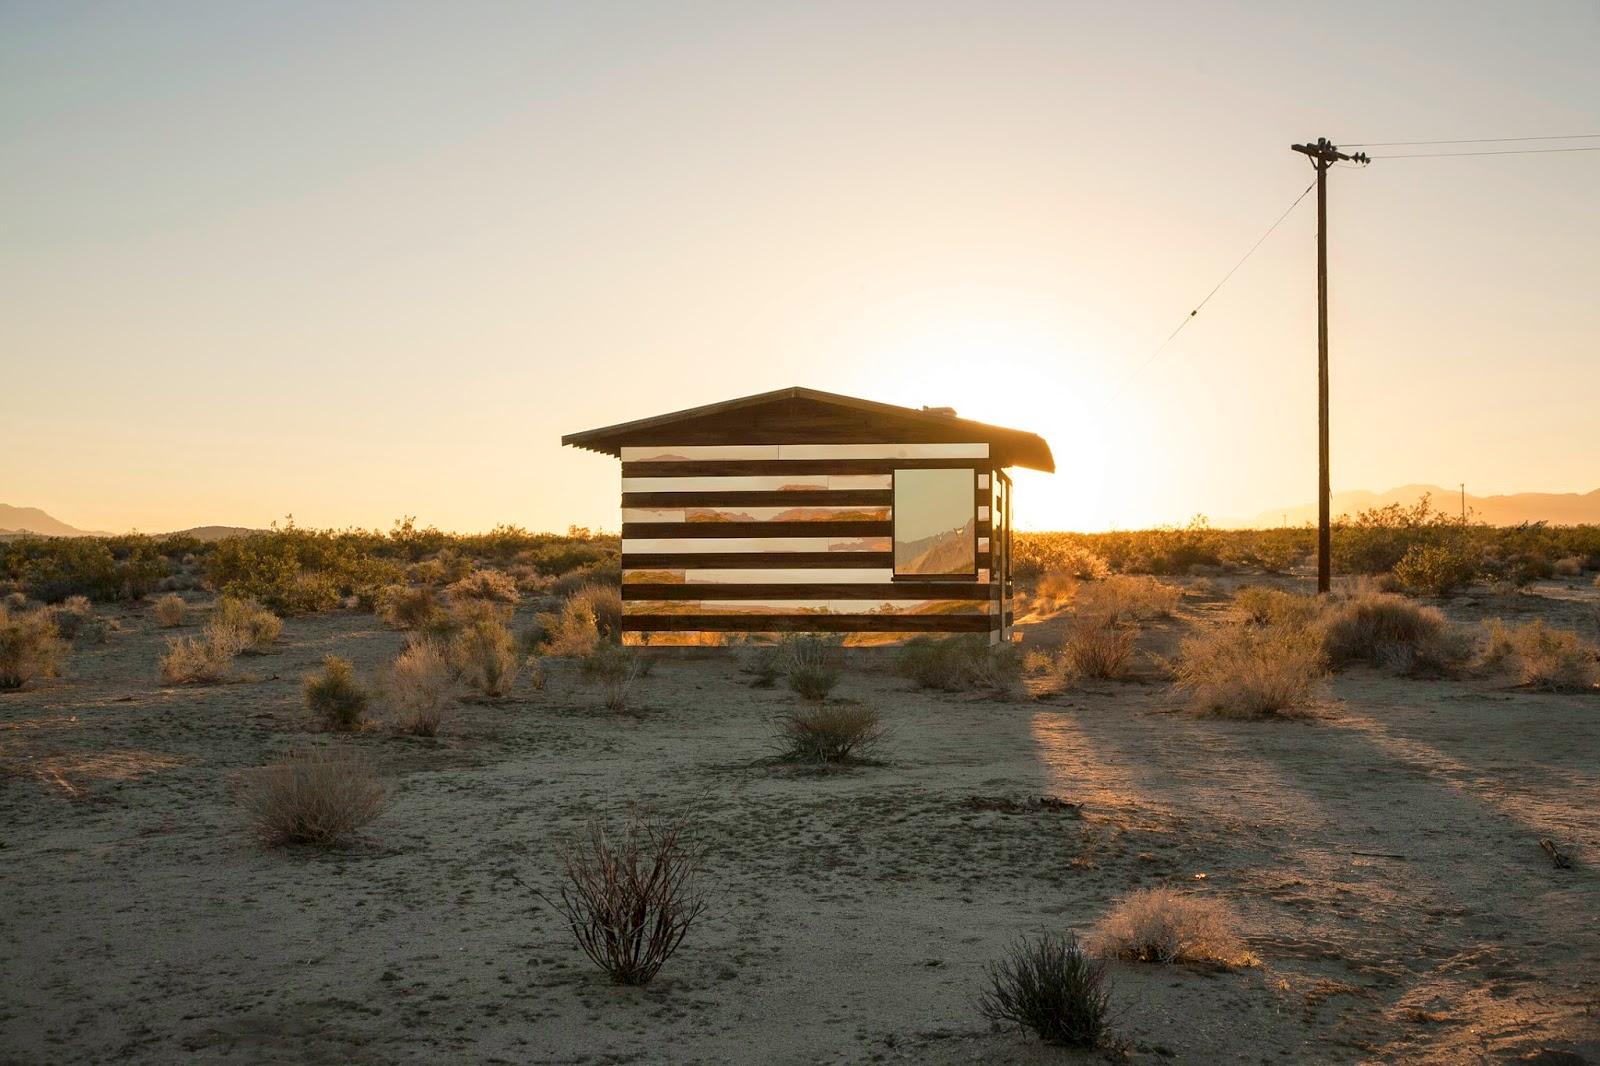 Lucid Stead, Phillip K Smith III, Joshua Tree, California